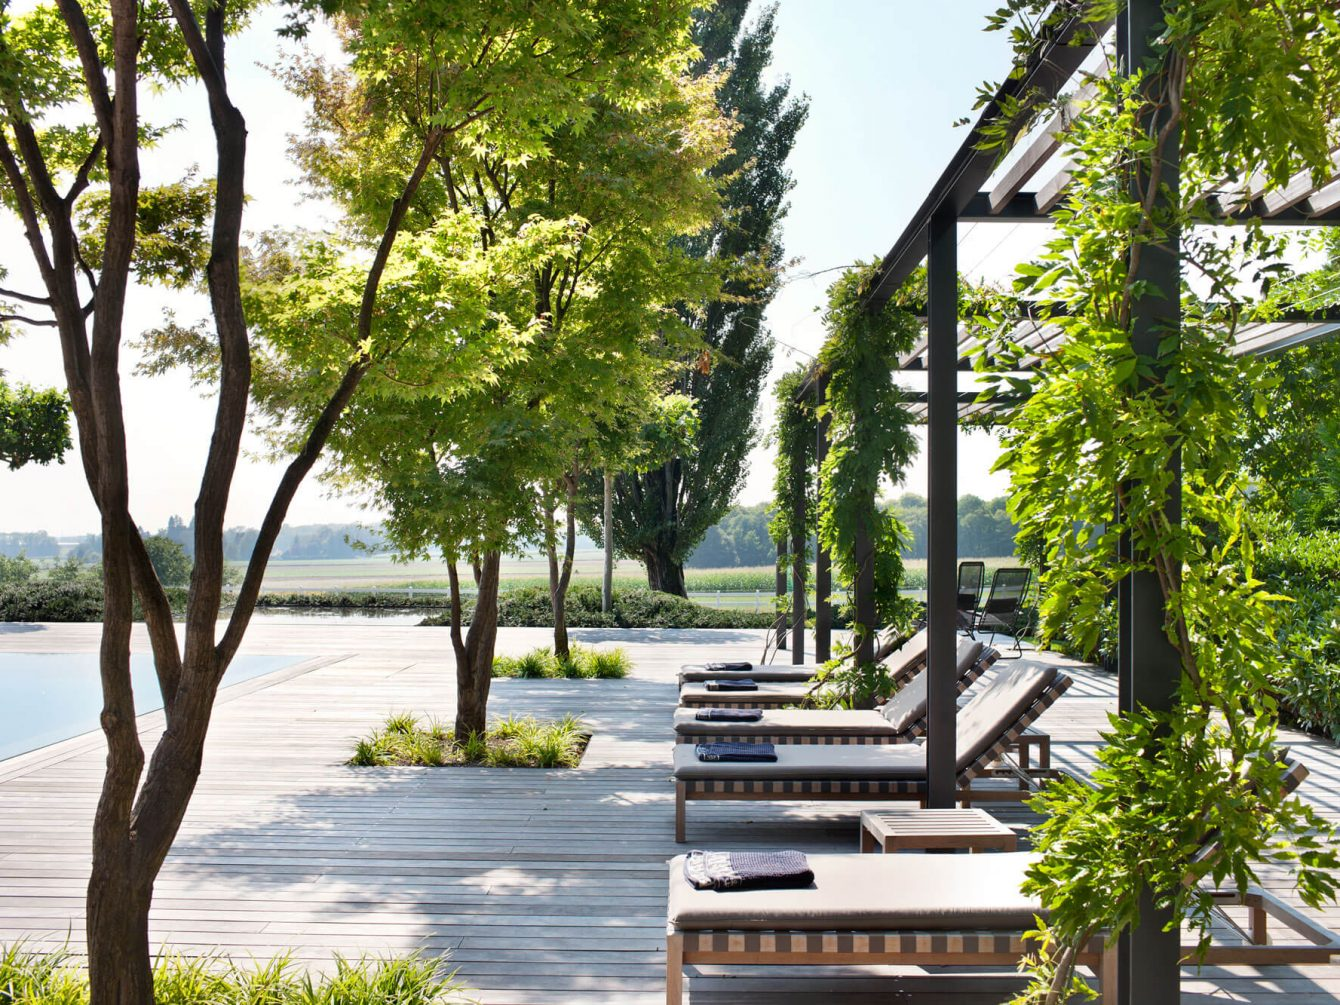 Enea Gmbh Enea Landscape Architecture